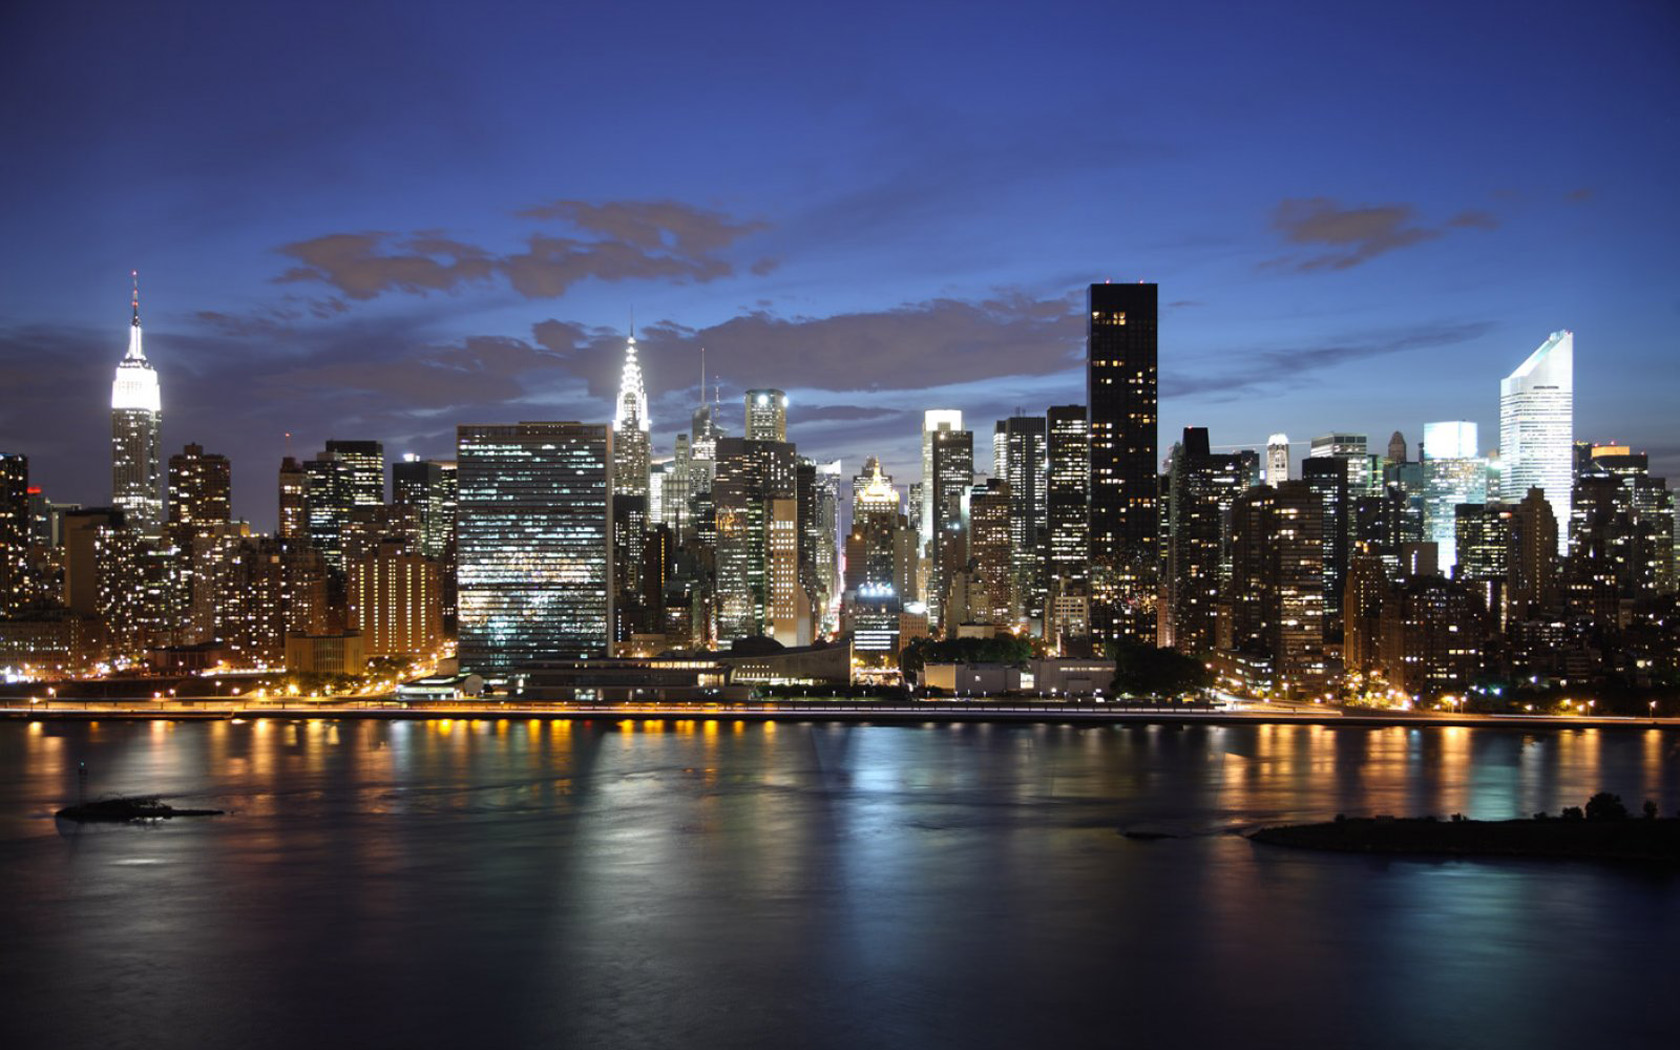 New York Skyline Night Wallpaper (1680x1050 pixel) City HD Wallpaper ...